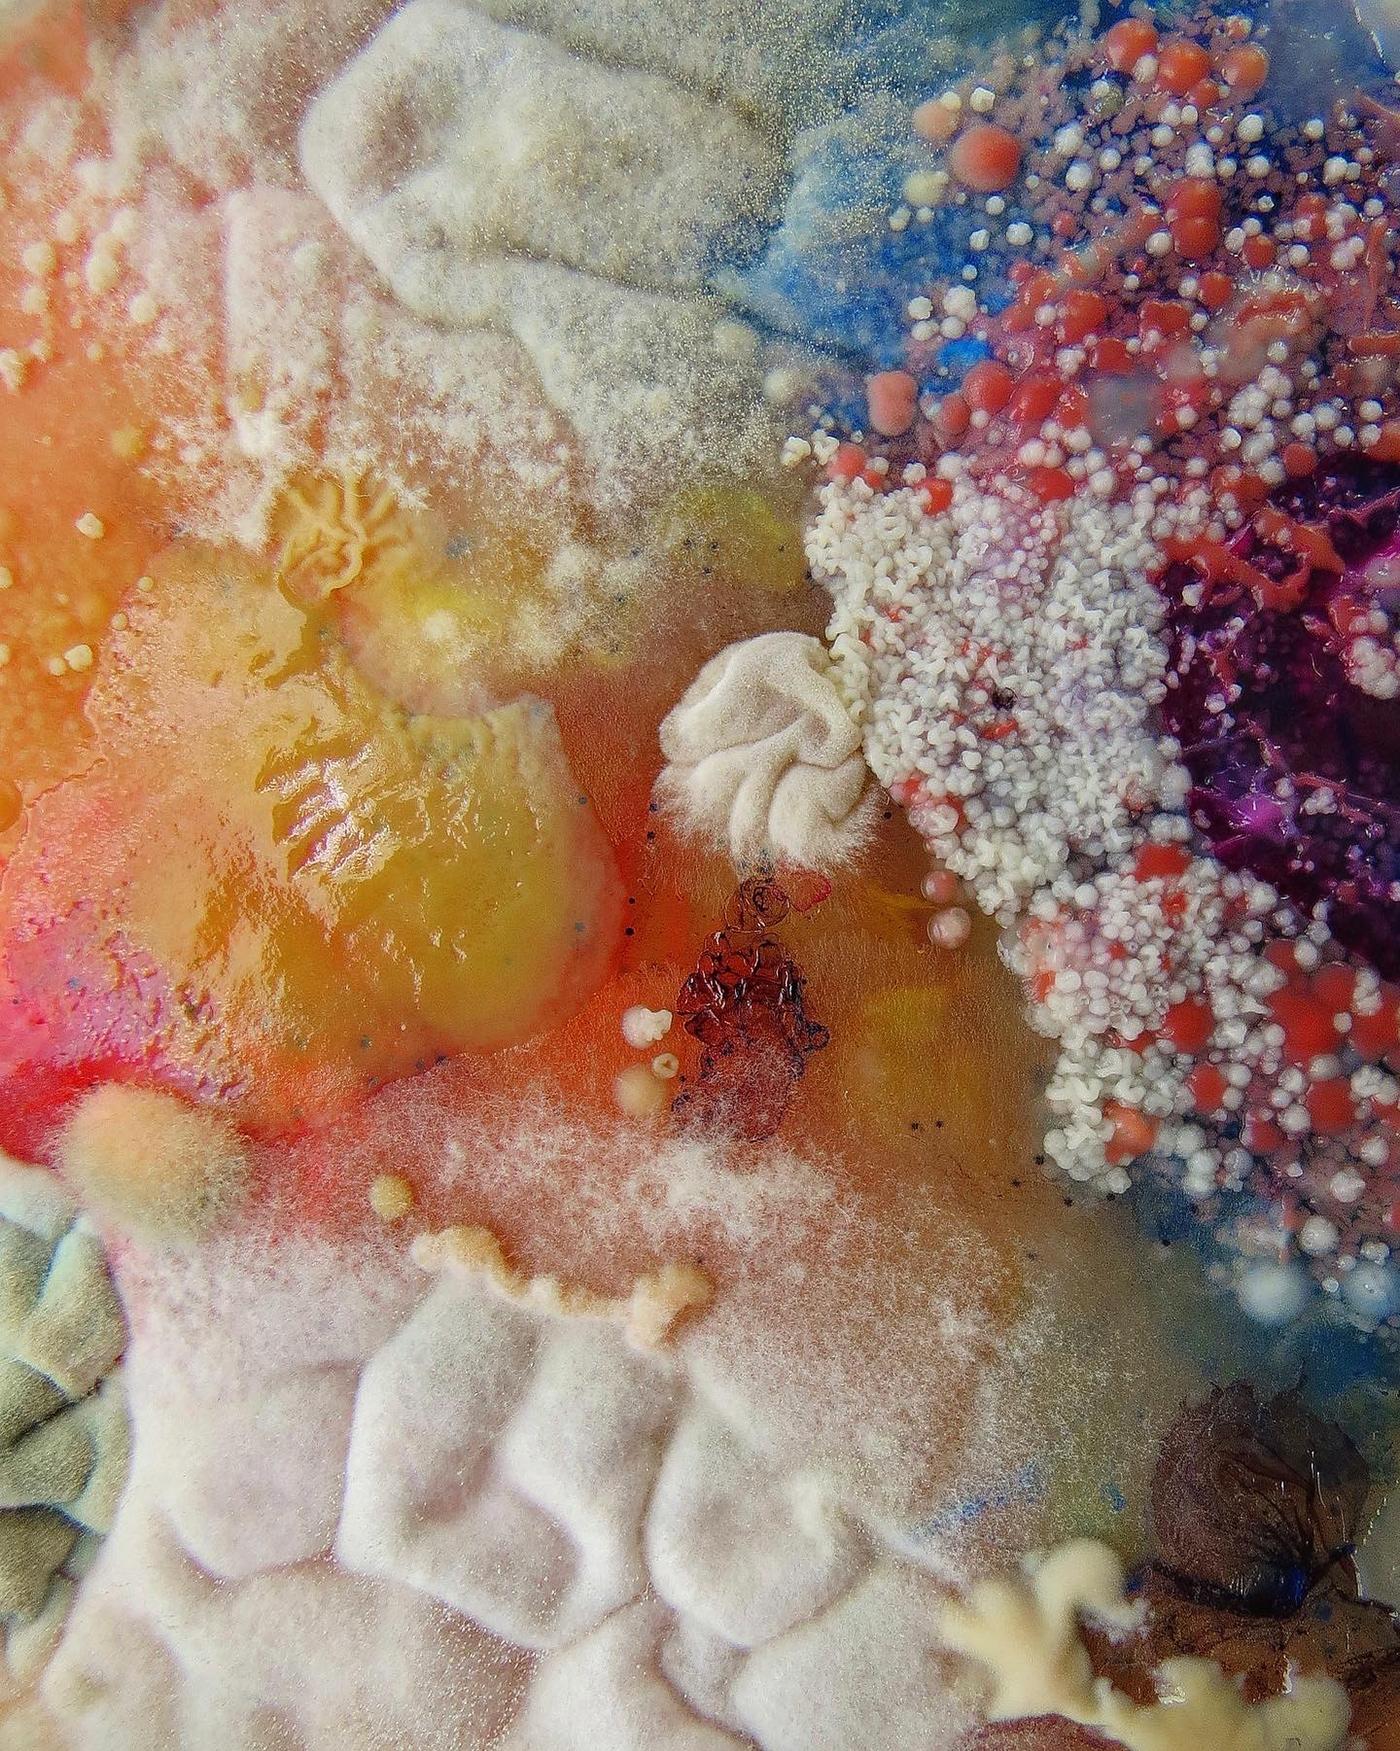 art artist background Bacteria bio bioart Biodesign closeup color contamination crop design edit Fungi grow layer mix Nature pattern science shade wallpaper